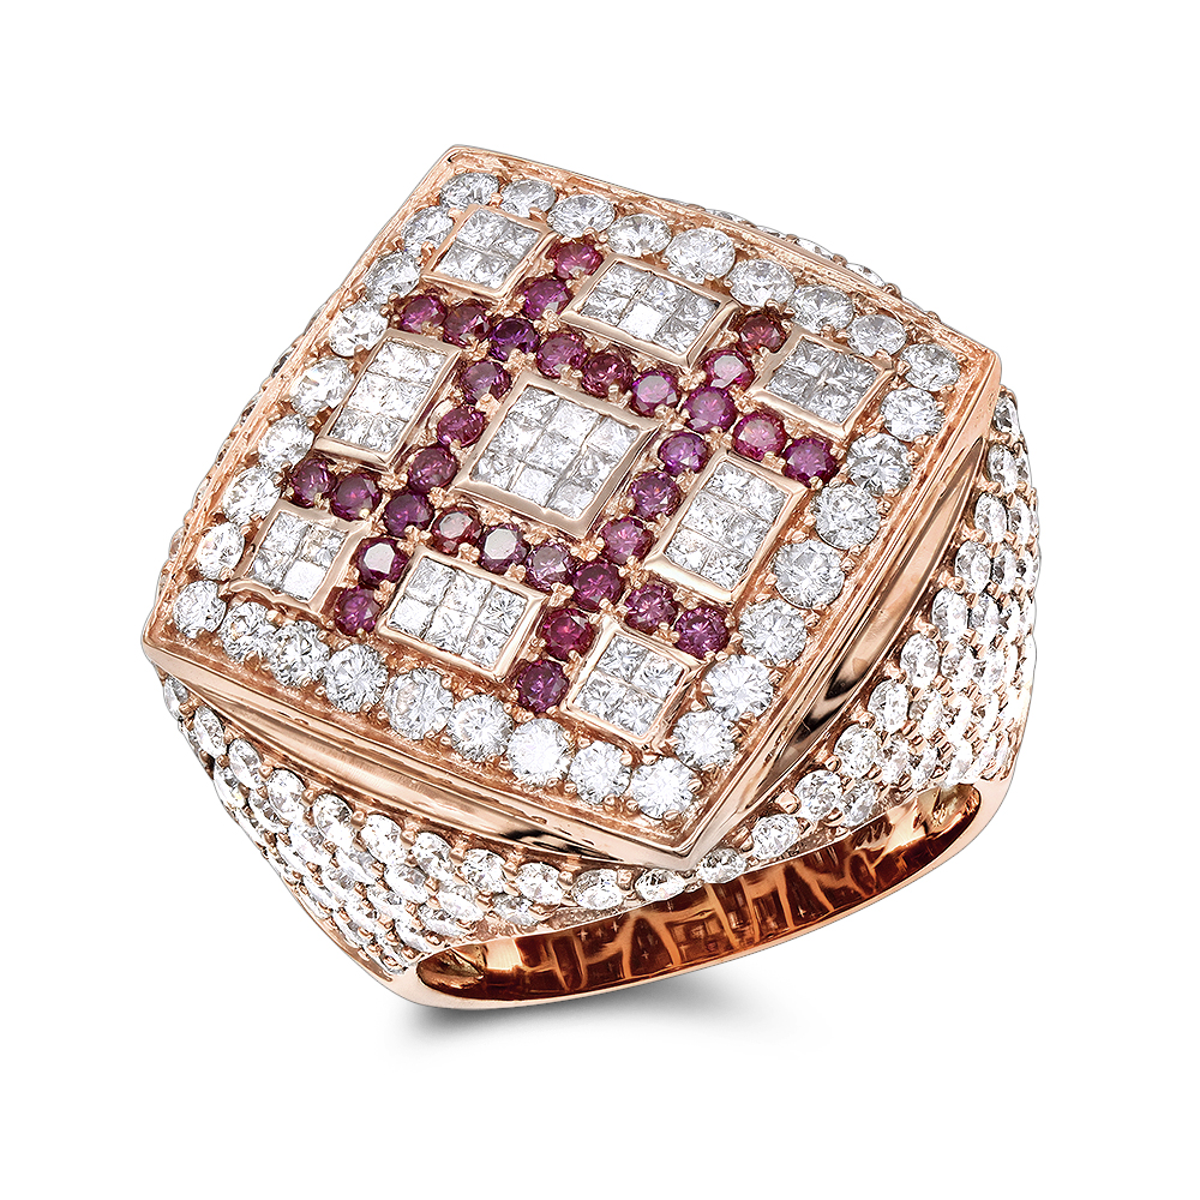 Unique 14K Gold Mens White Pink Criss Cross Diamond Ring 7.13ct